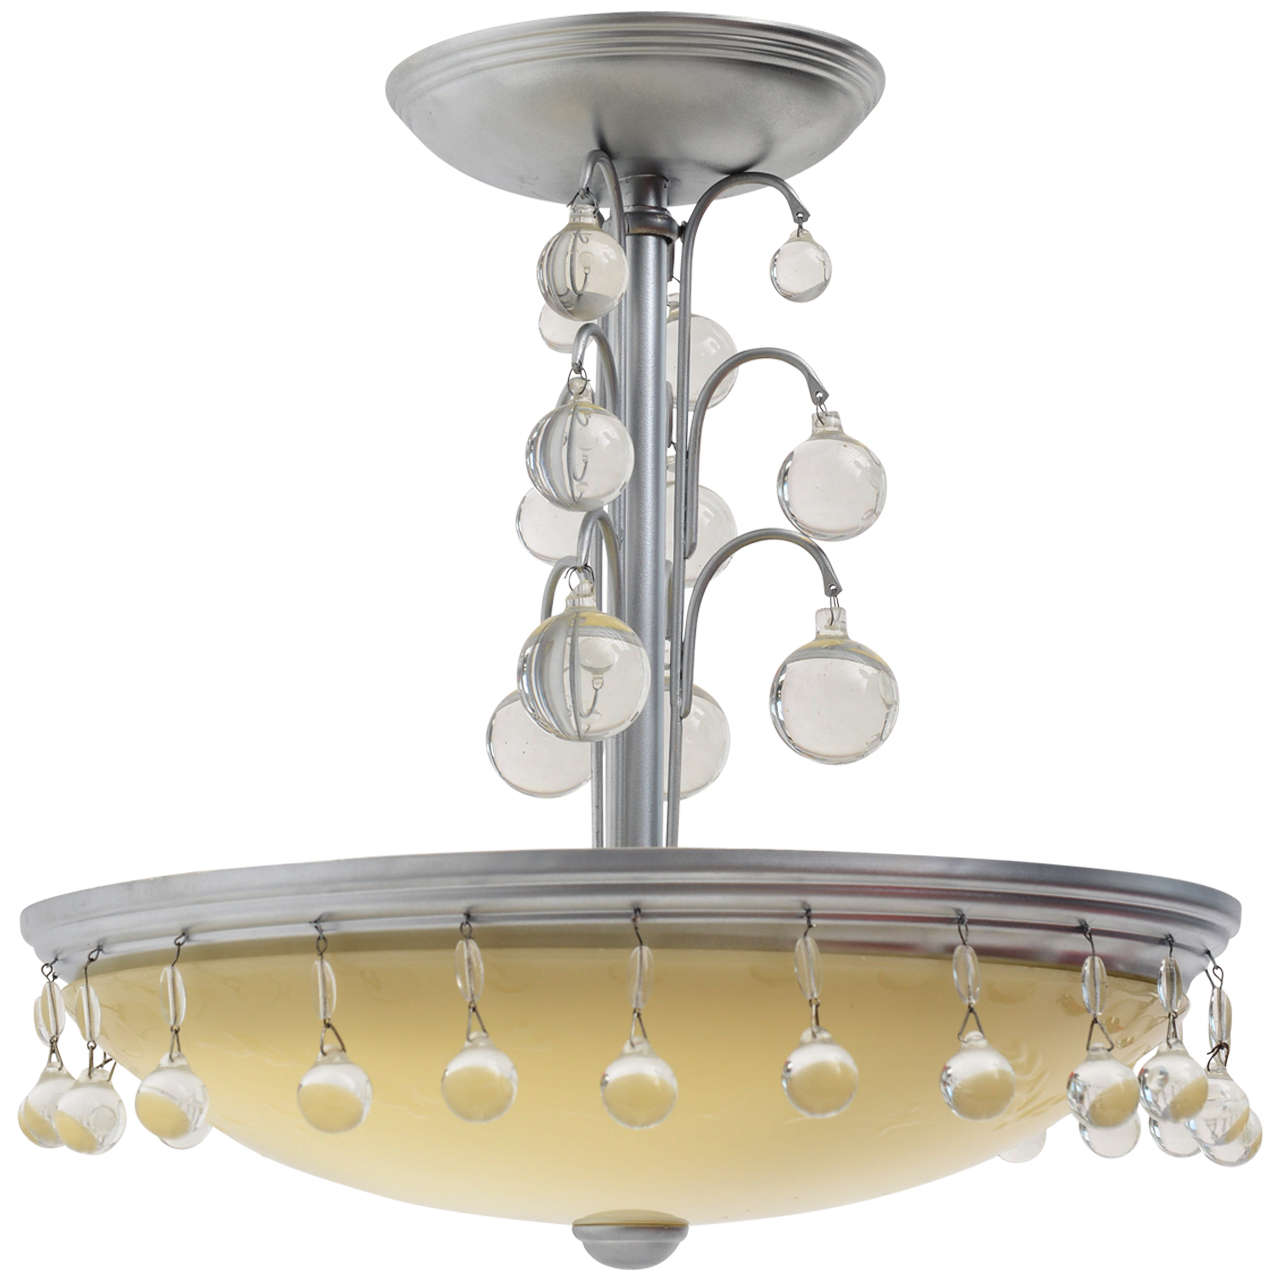 Whimsical Art Deco Hanging Chandelier Light Fixture At 1stdibs